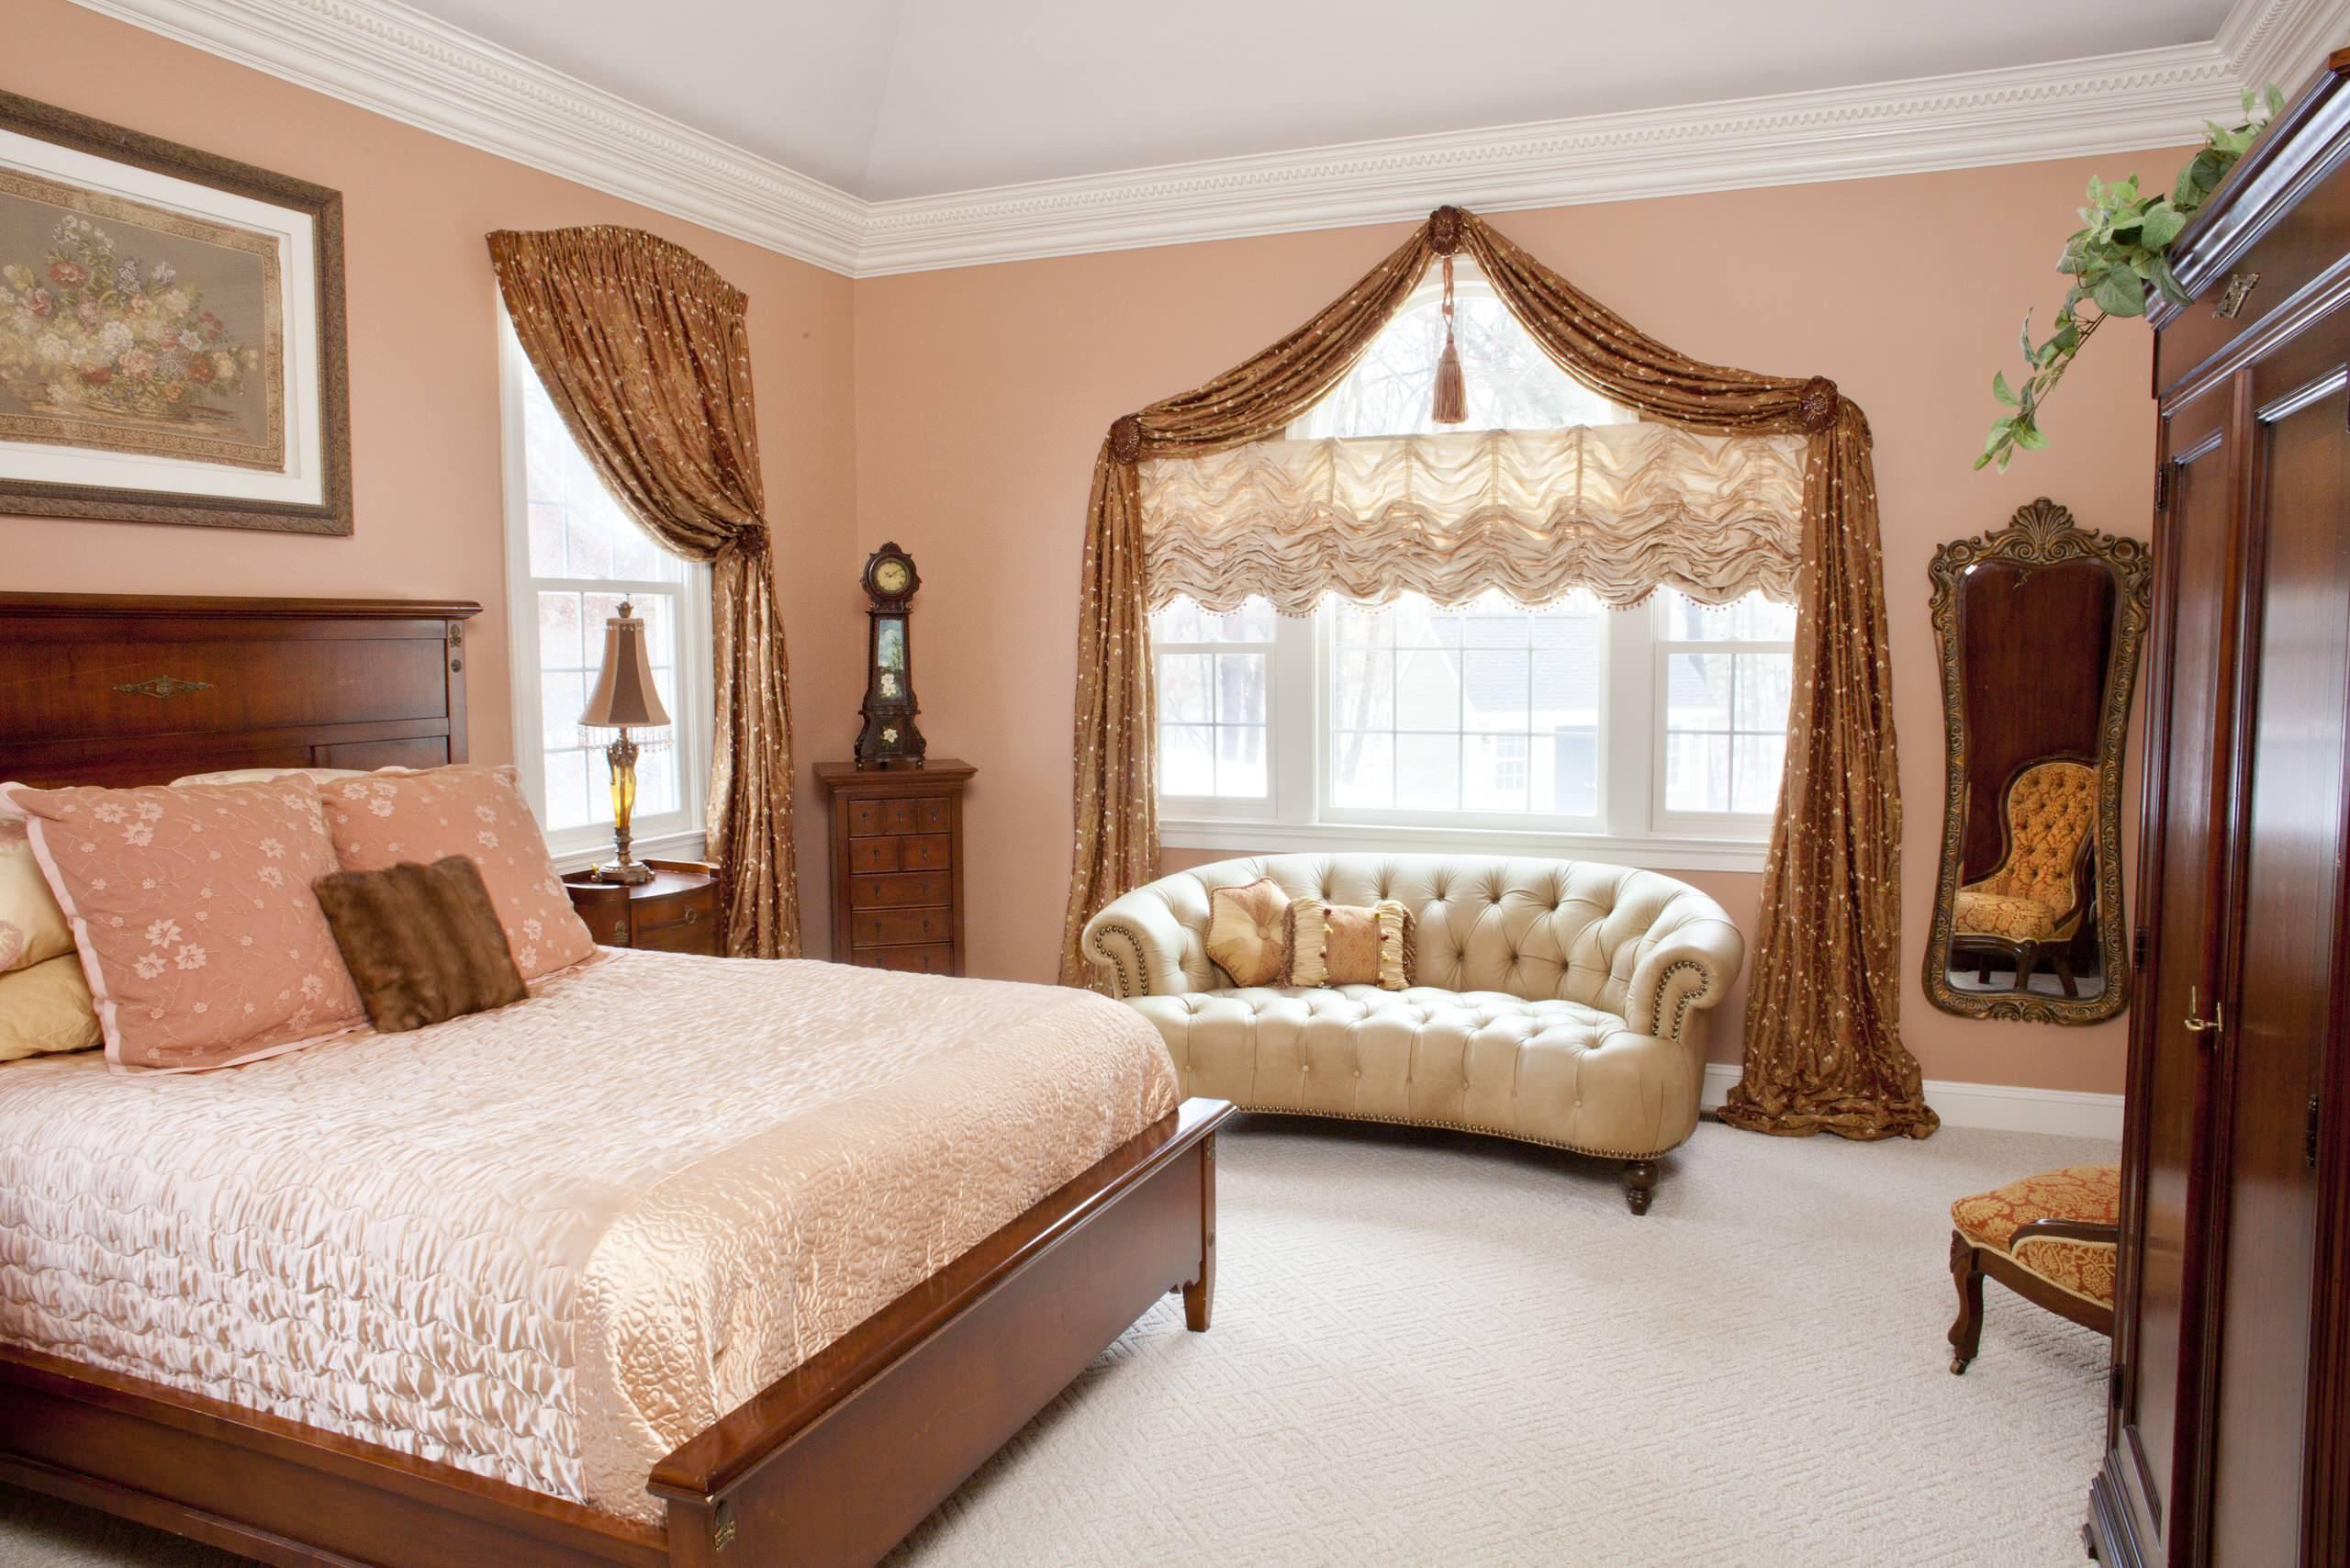 Уютная спальная комната, оформленная в теплых тонах